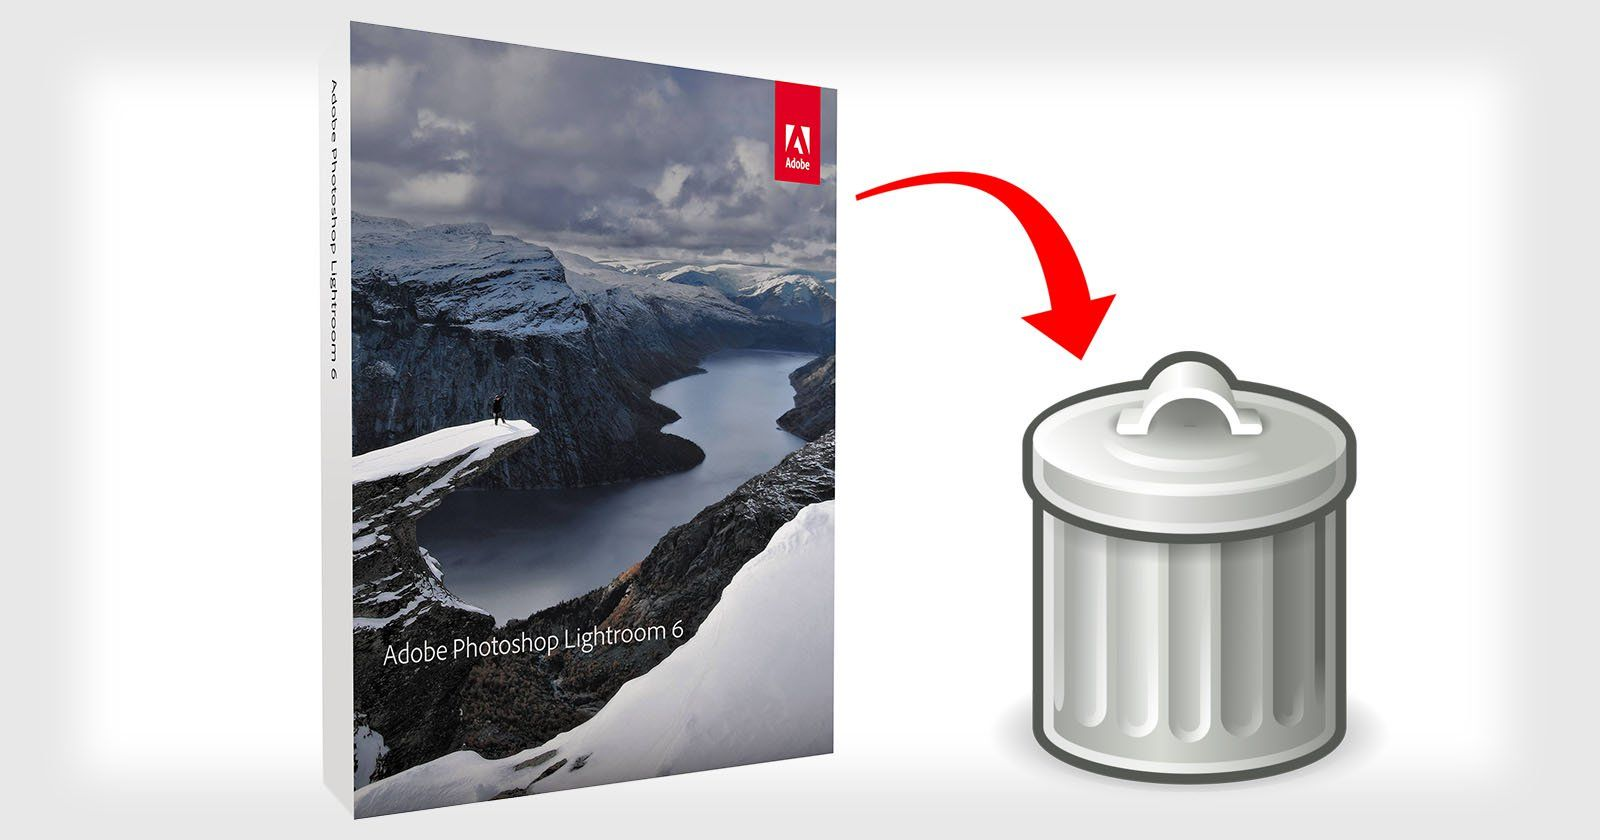 Adobe Updater Deletes Lightroom 6: Here's How to Get It Back